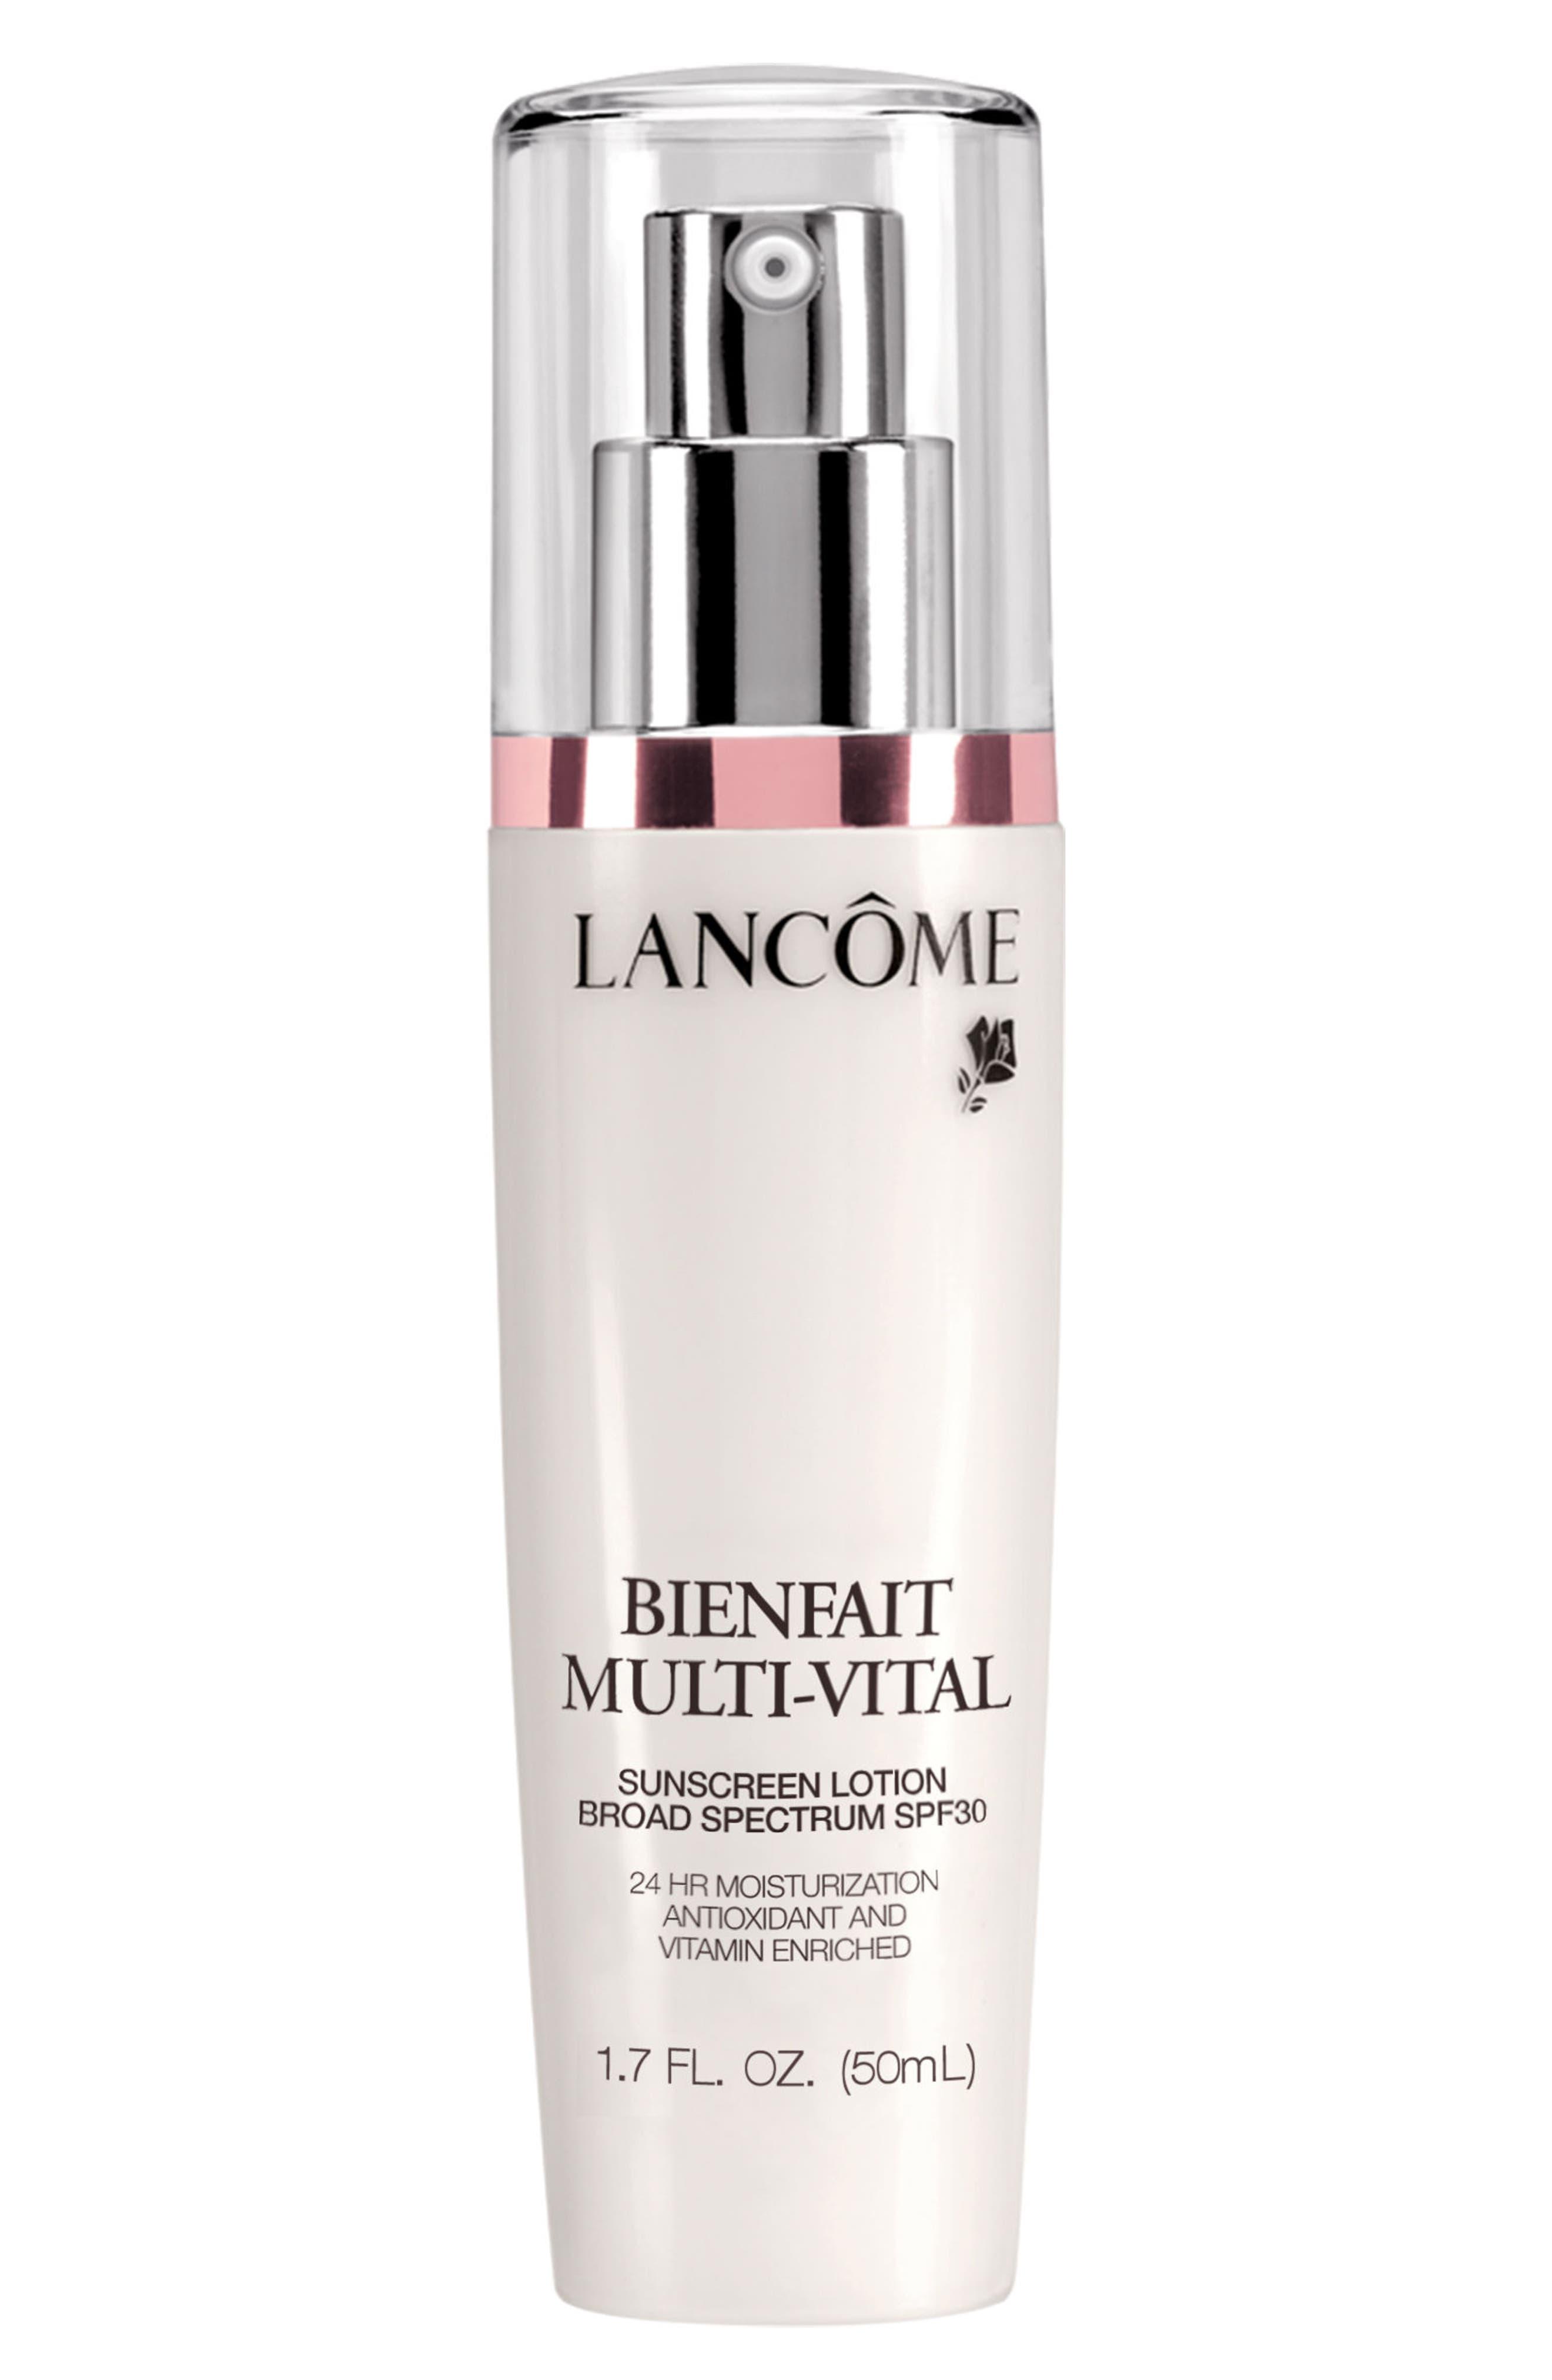 Alternate Image 1 Selected - Lancôme 'Bienfait Multi-Vital' SPF 30 Sunscreen